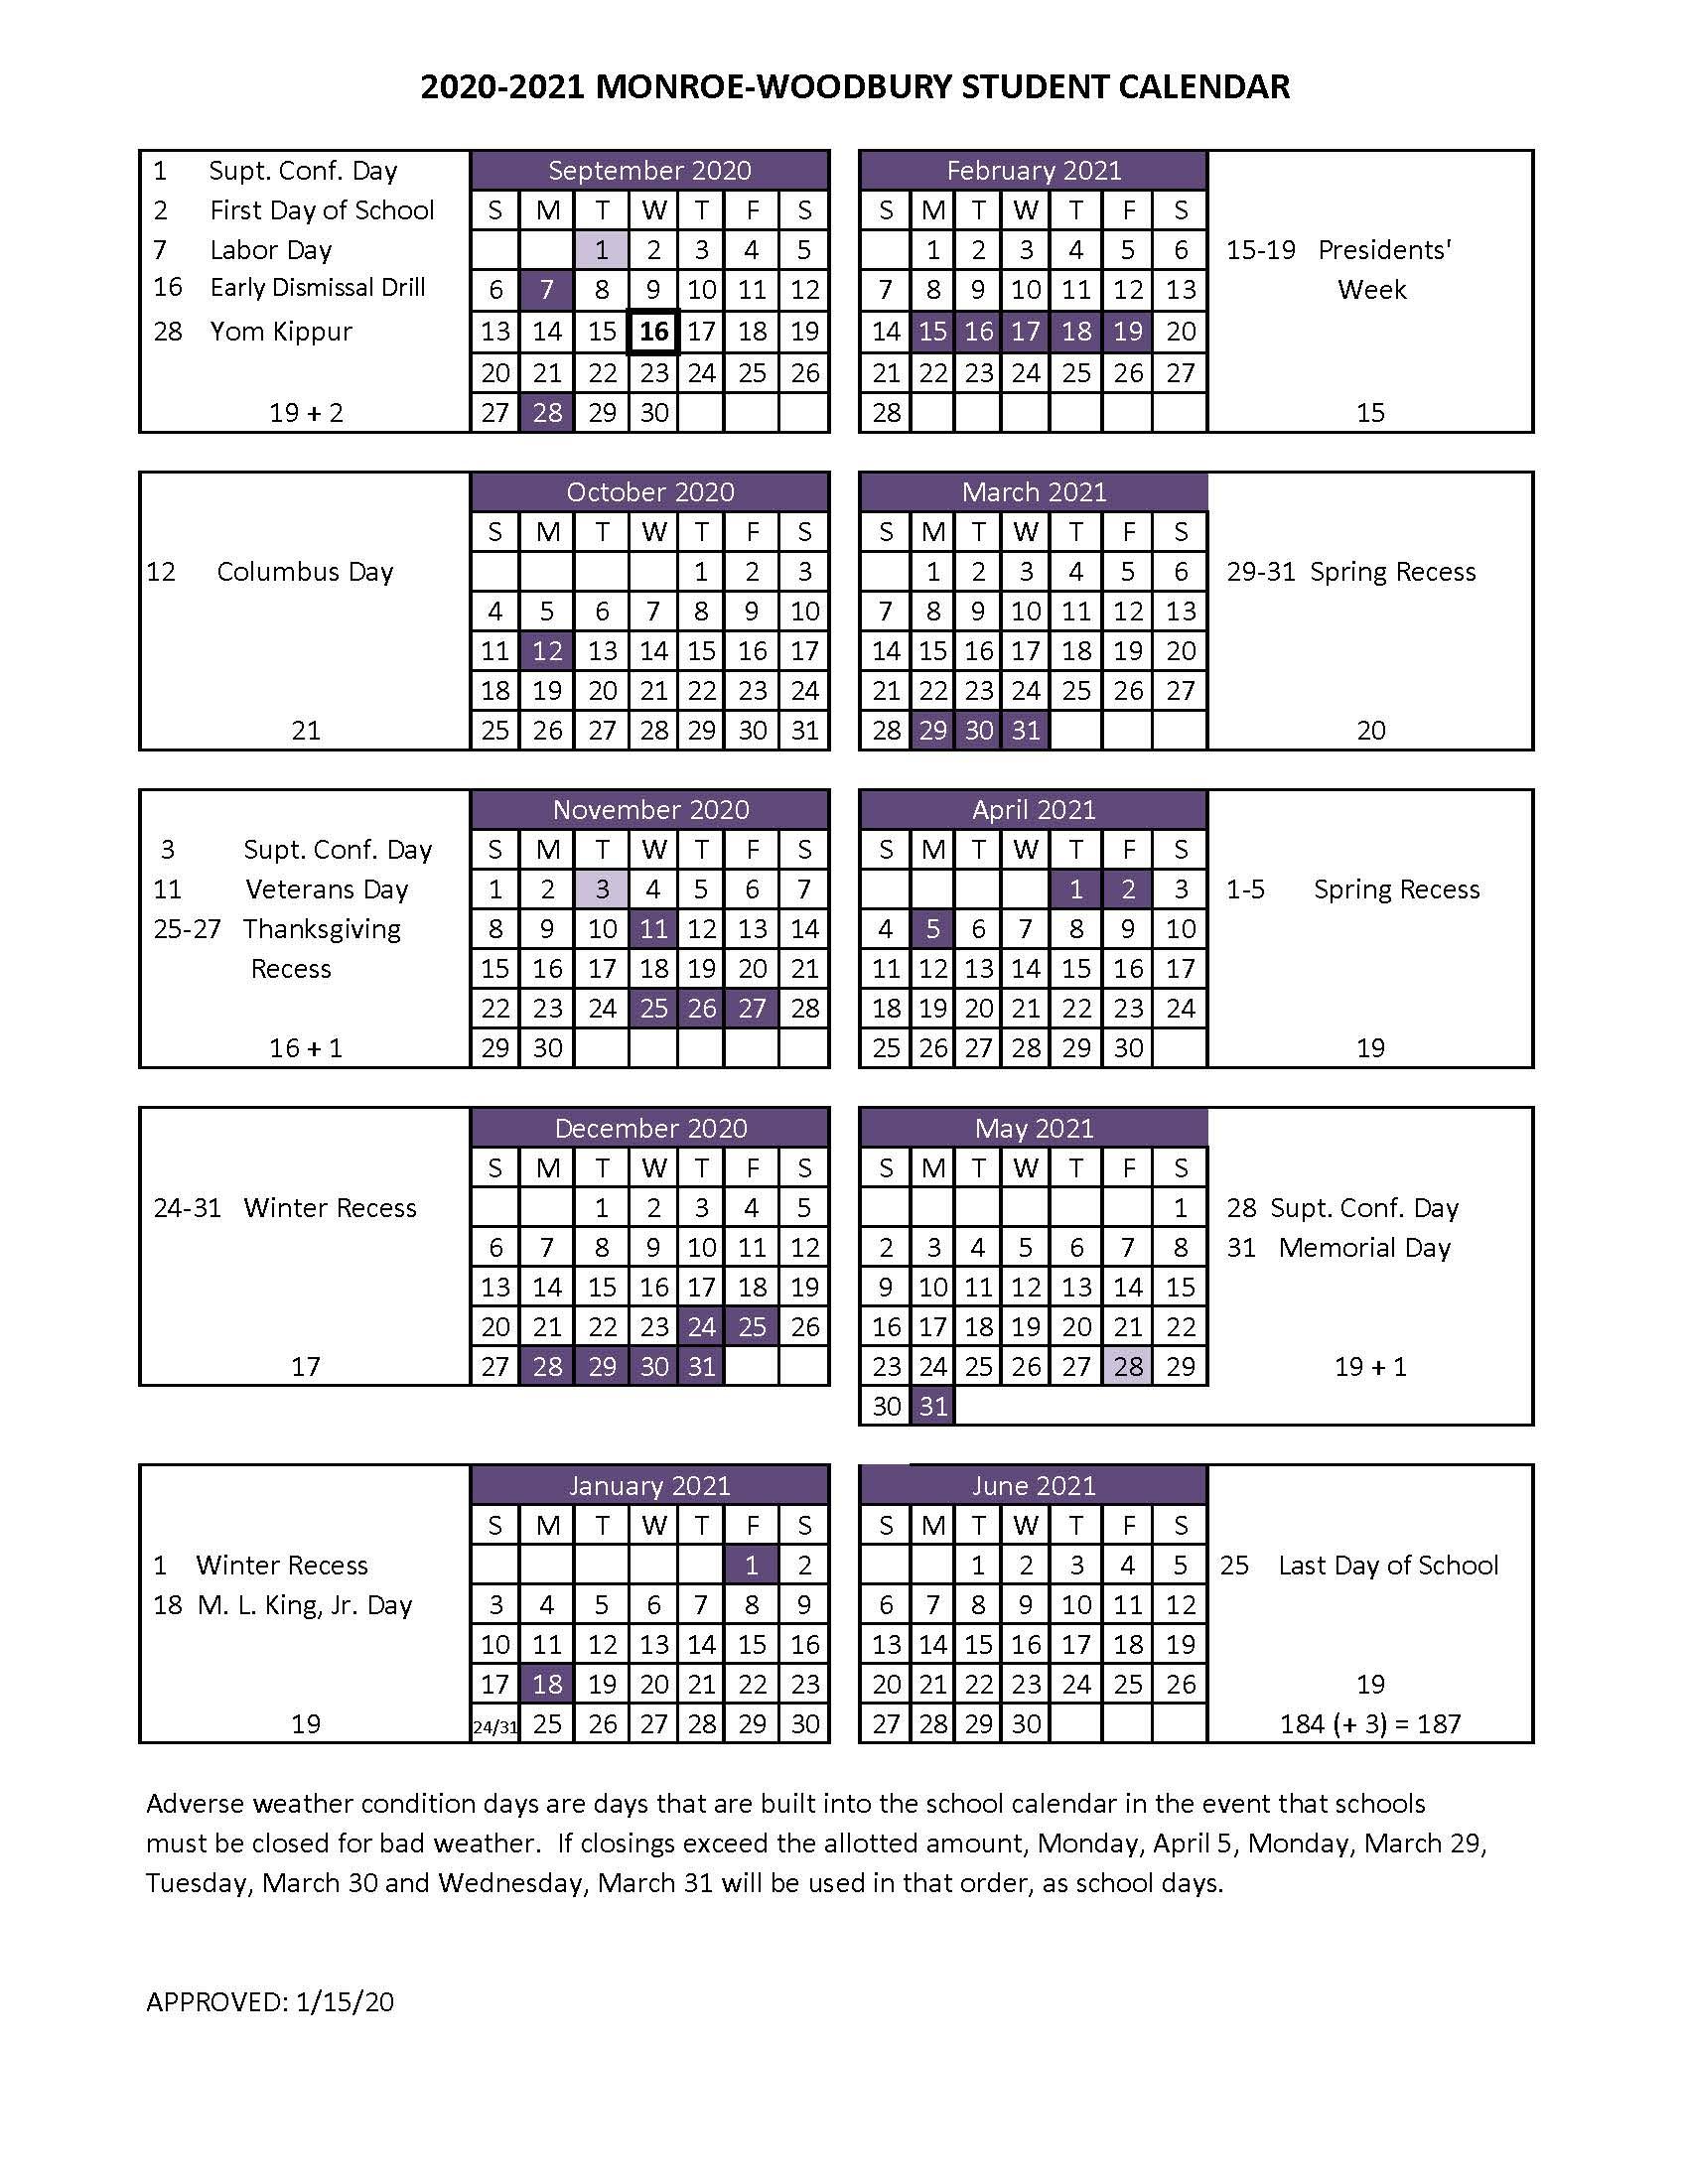 Boe Adopts 2020-2021 Student Calendar - Monroe-Woodbury